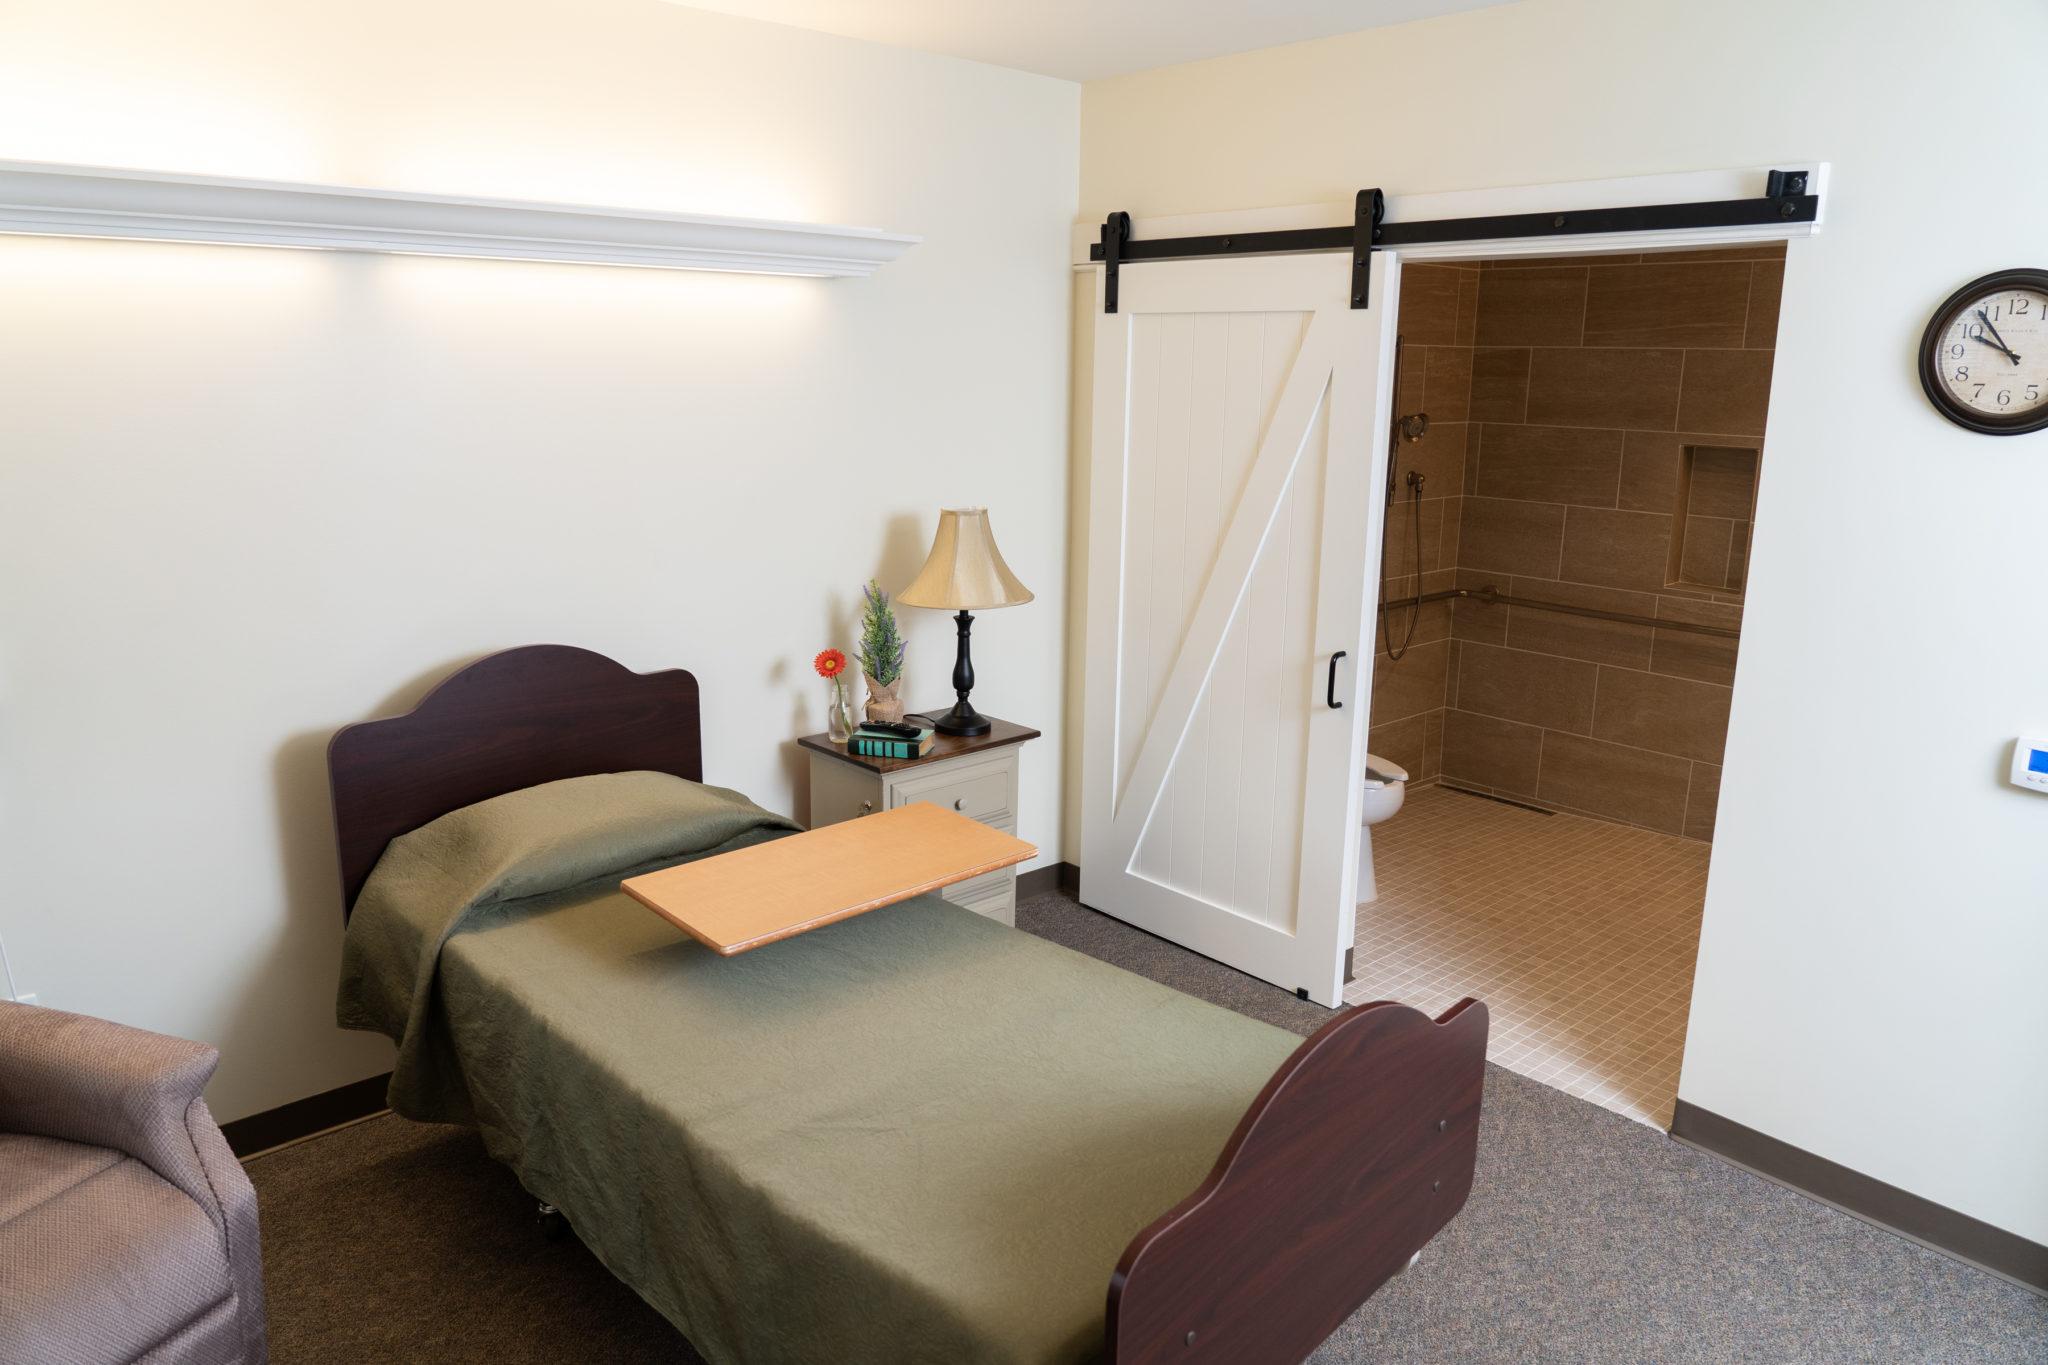 Short-Term Rehab Room